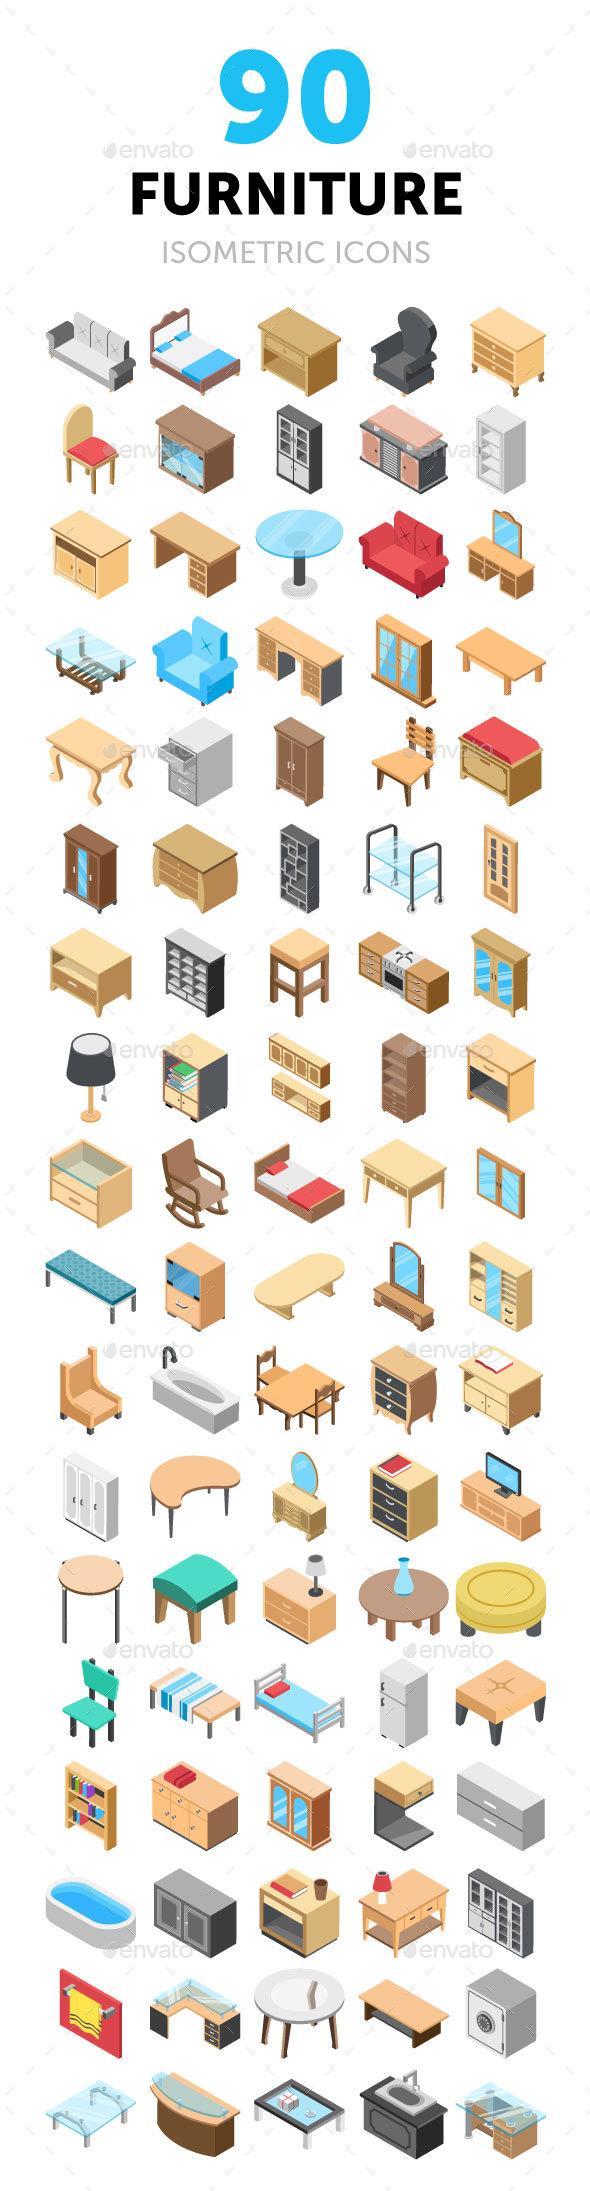 90 Furniture Isometric Icons - Icons